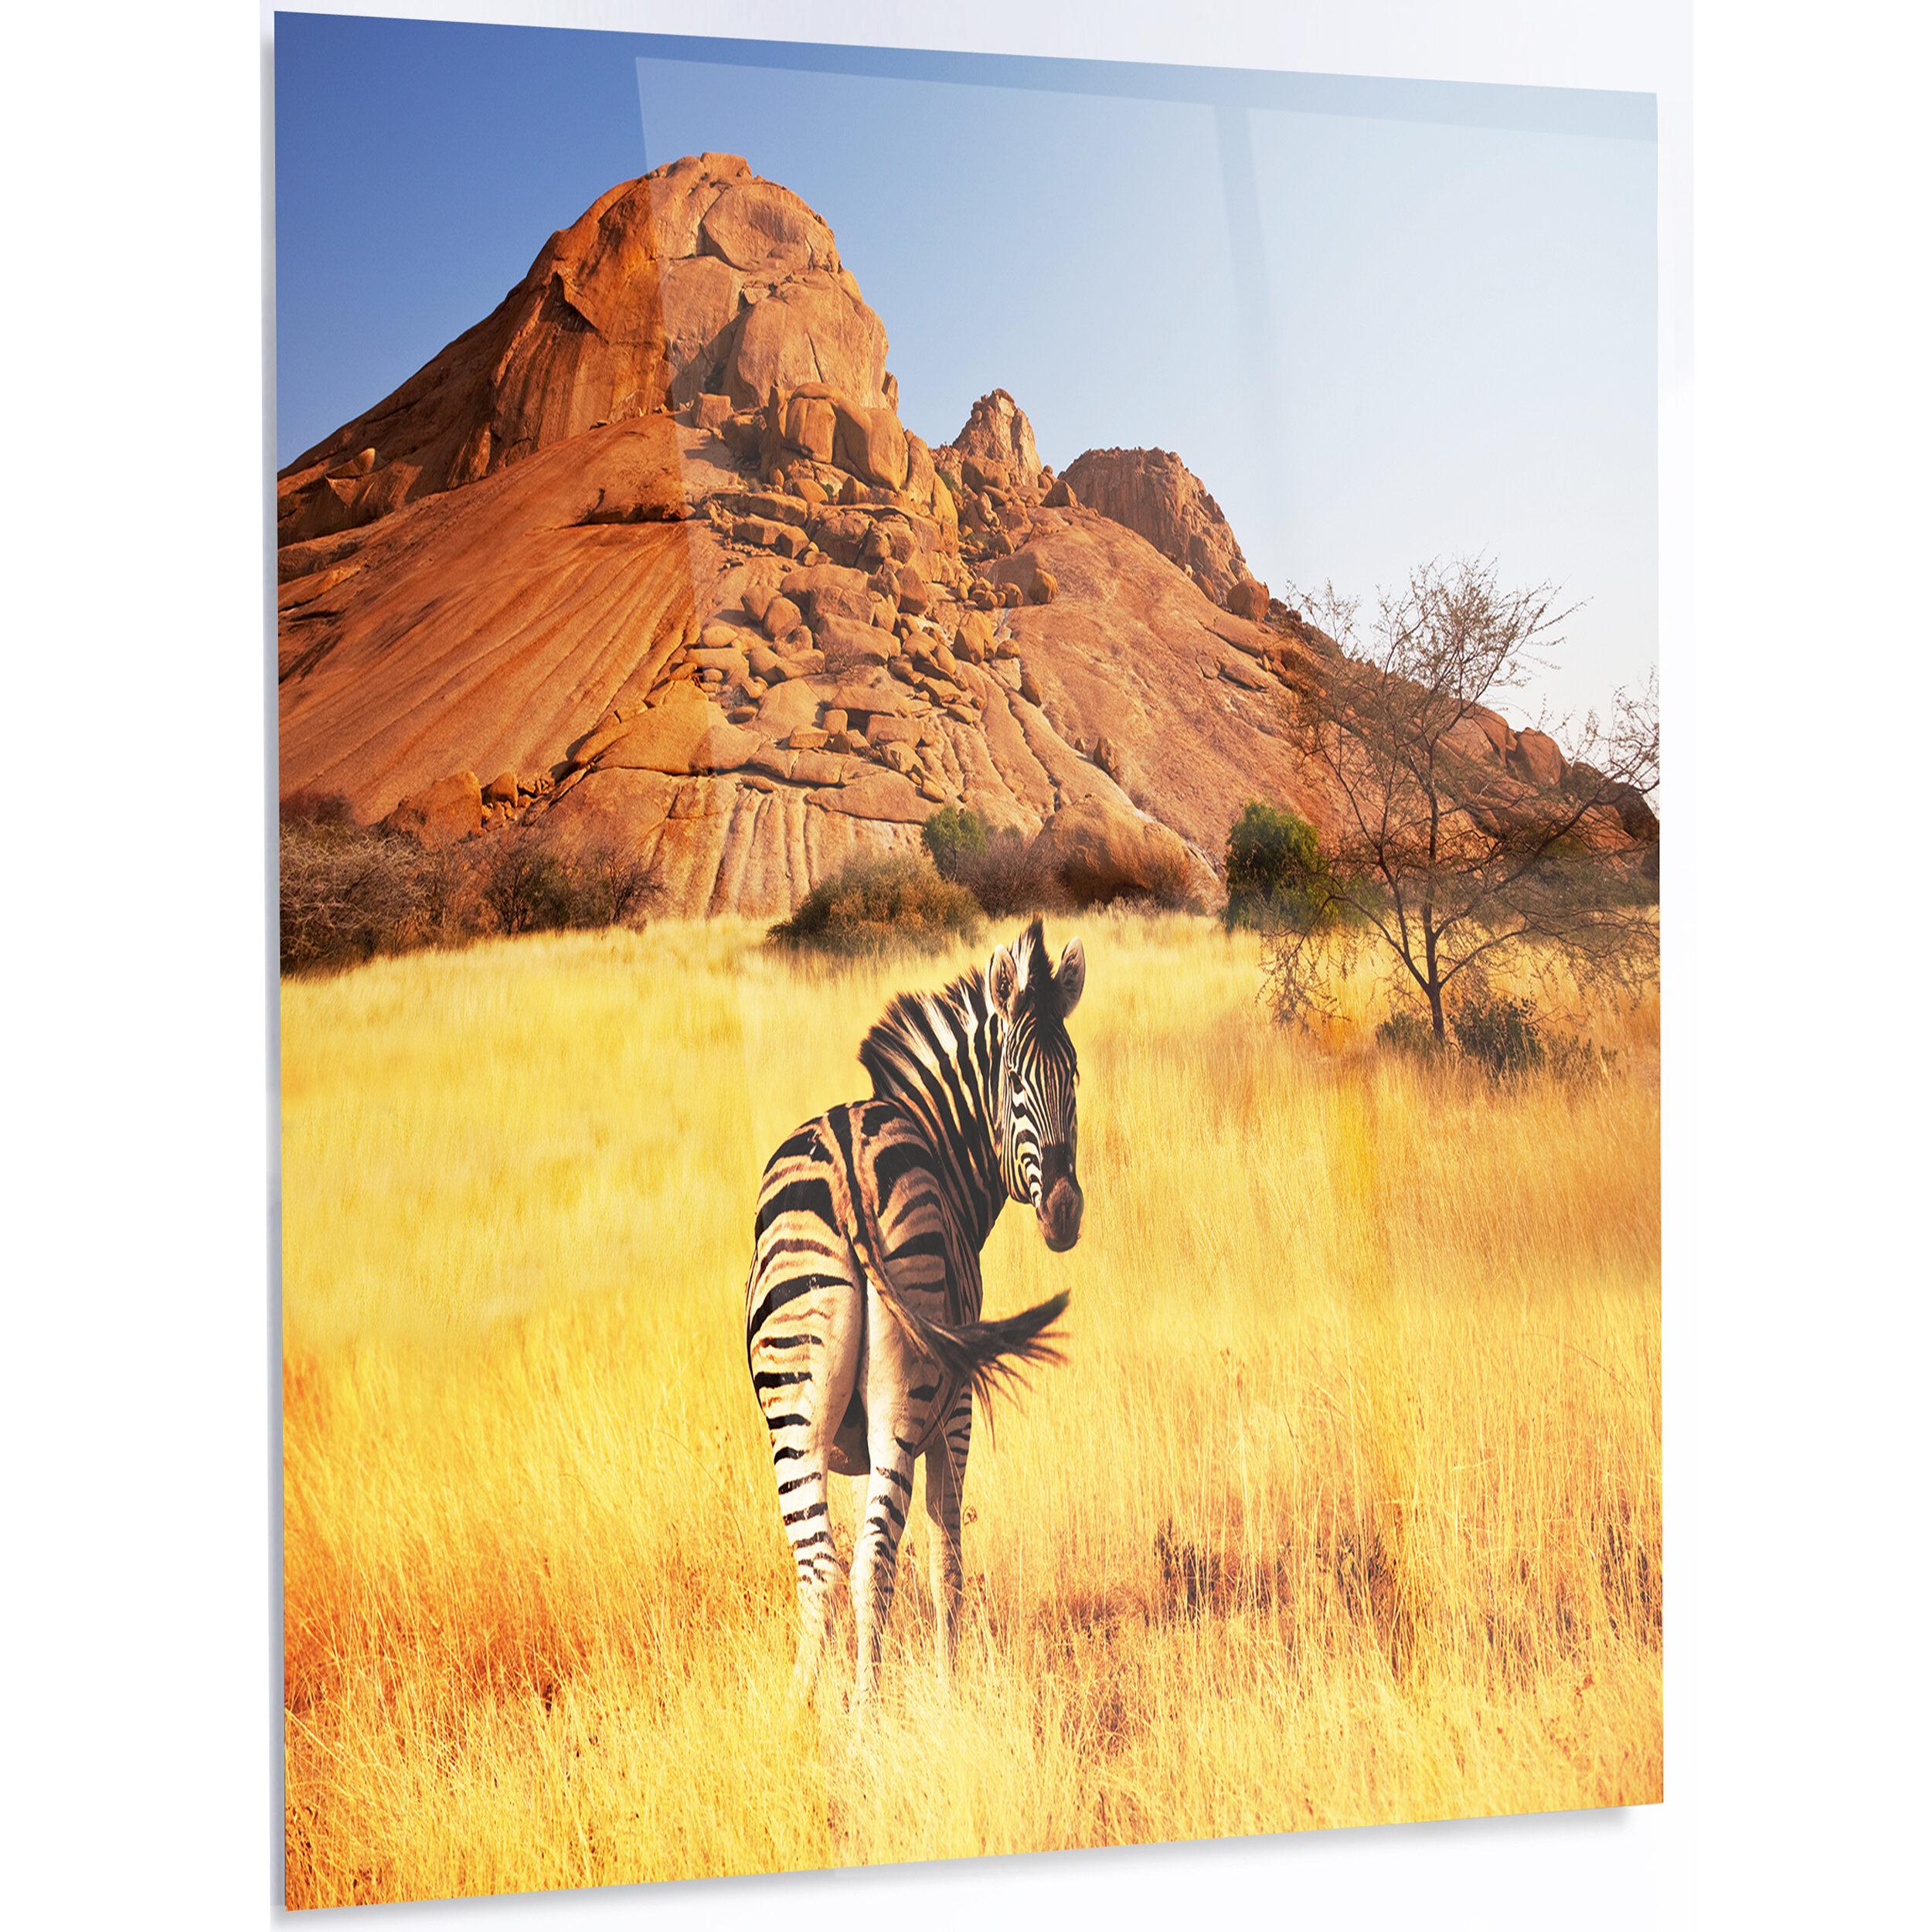 DesignArt \'Lonely Zebra in African Prairie\' Photographic Print on ...